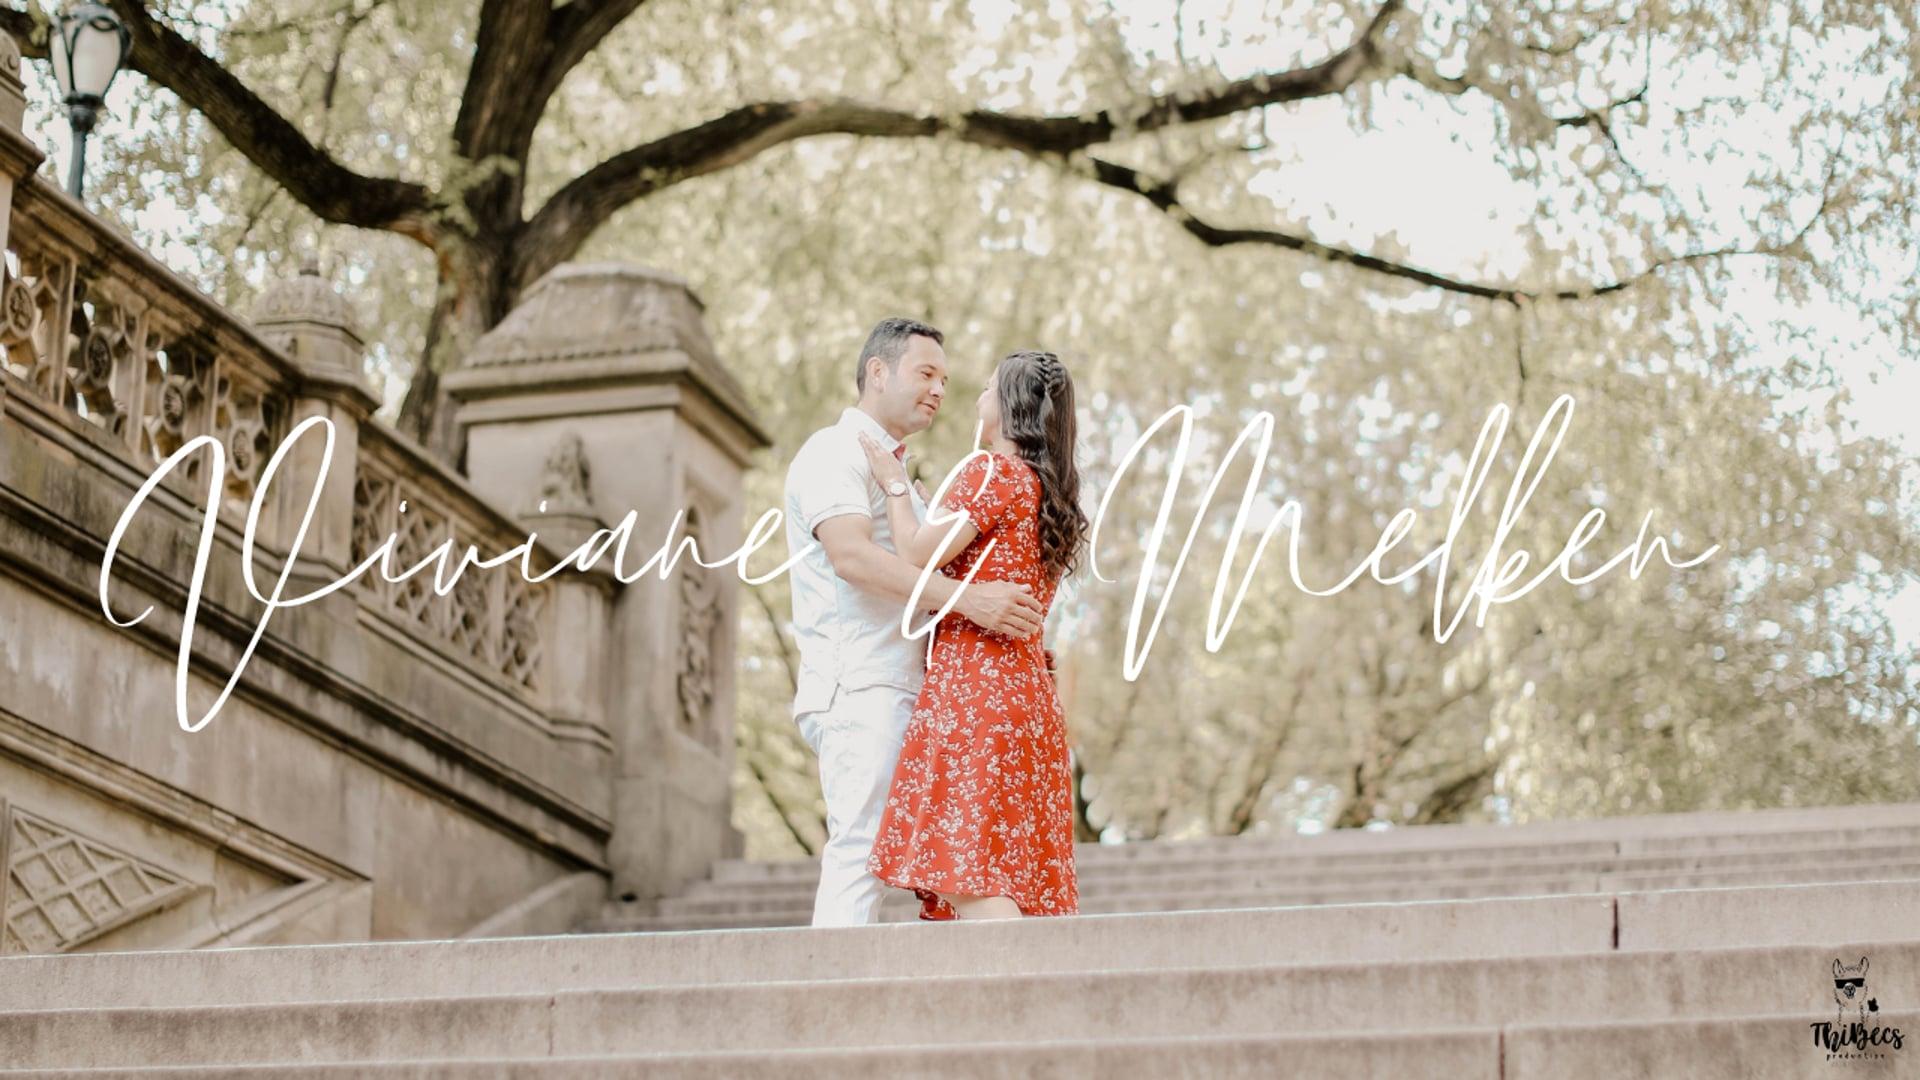 Viviane & Melken   Save the Date   New York City